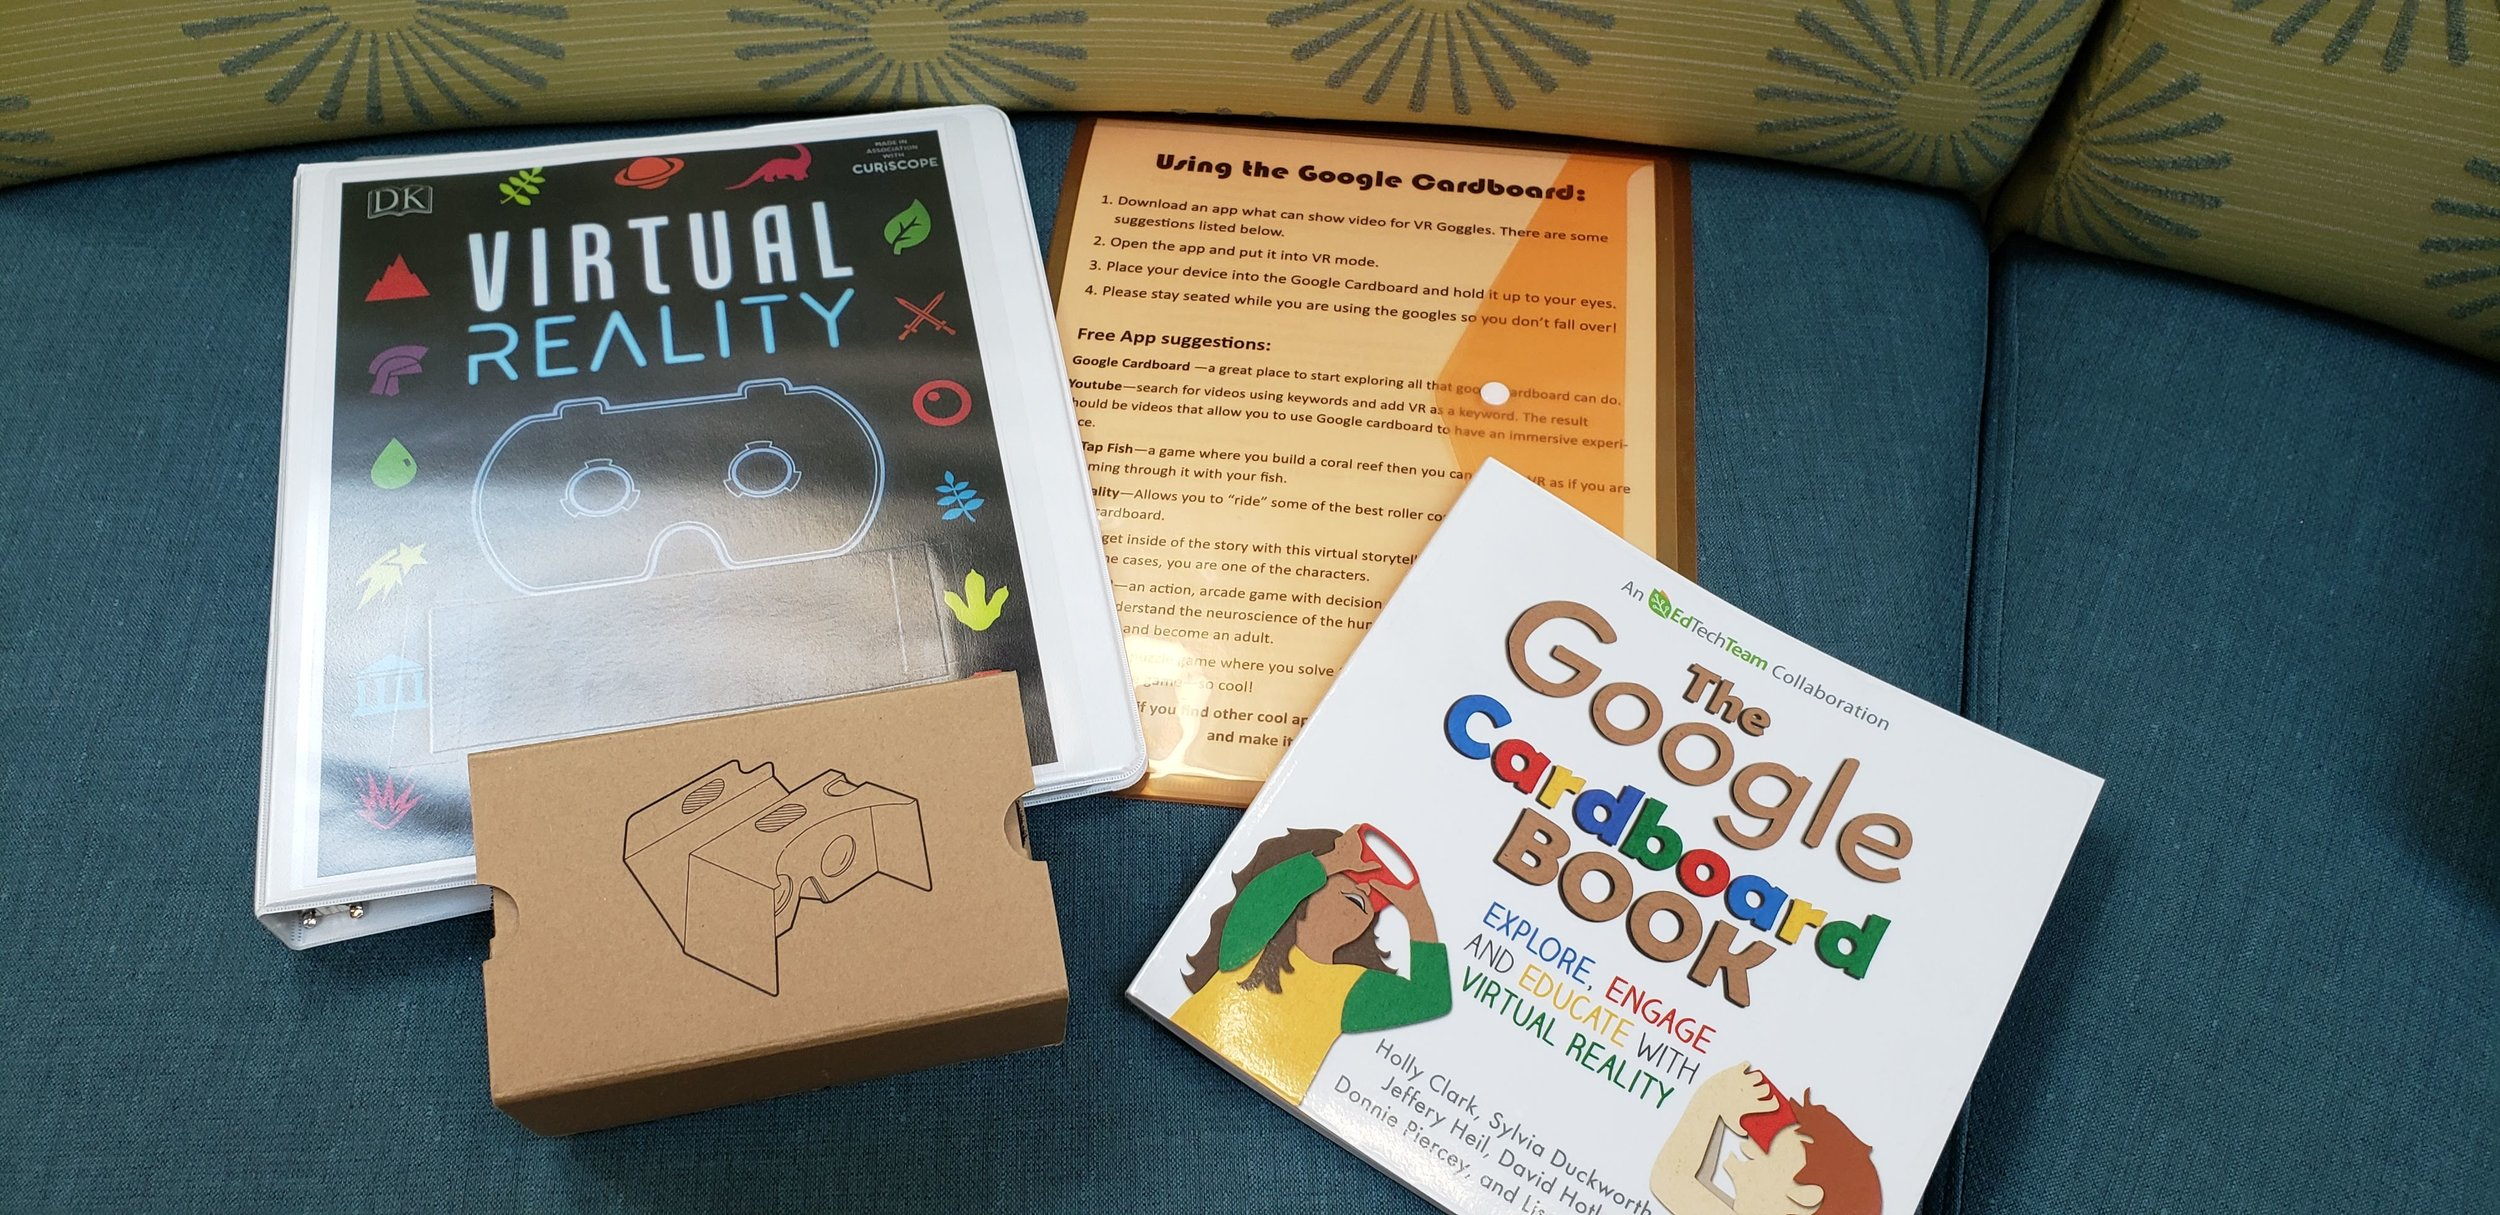 Google Cardboard.jpg